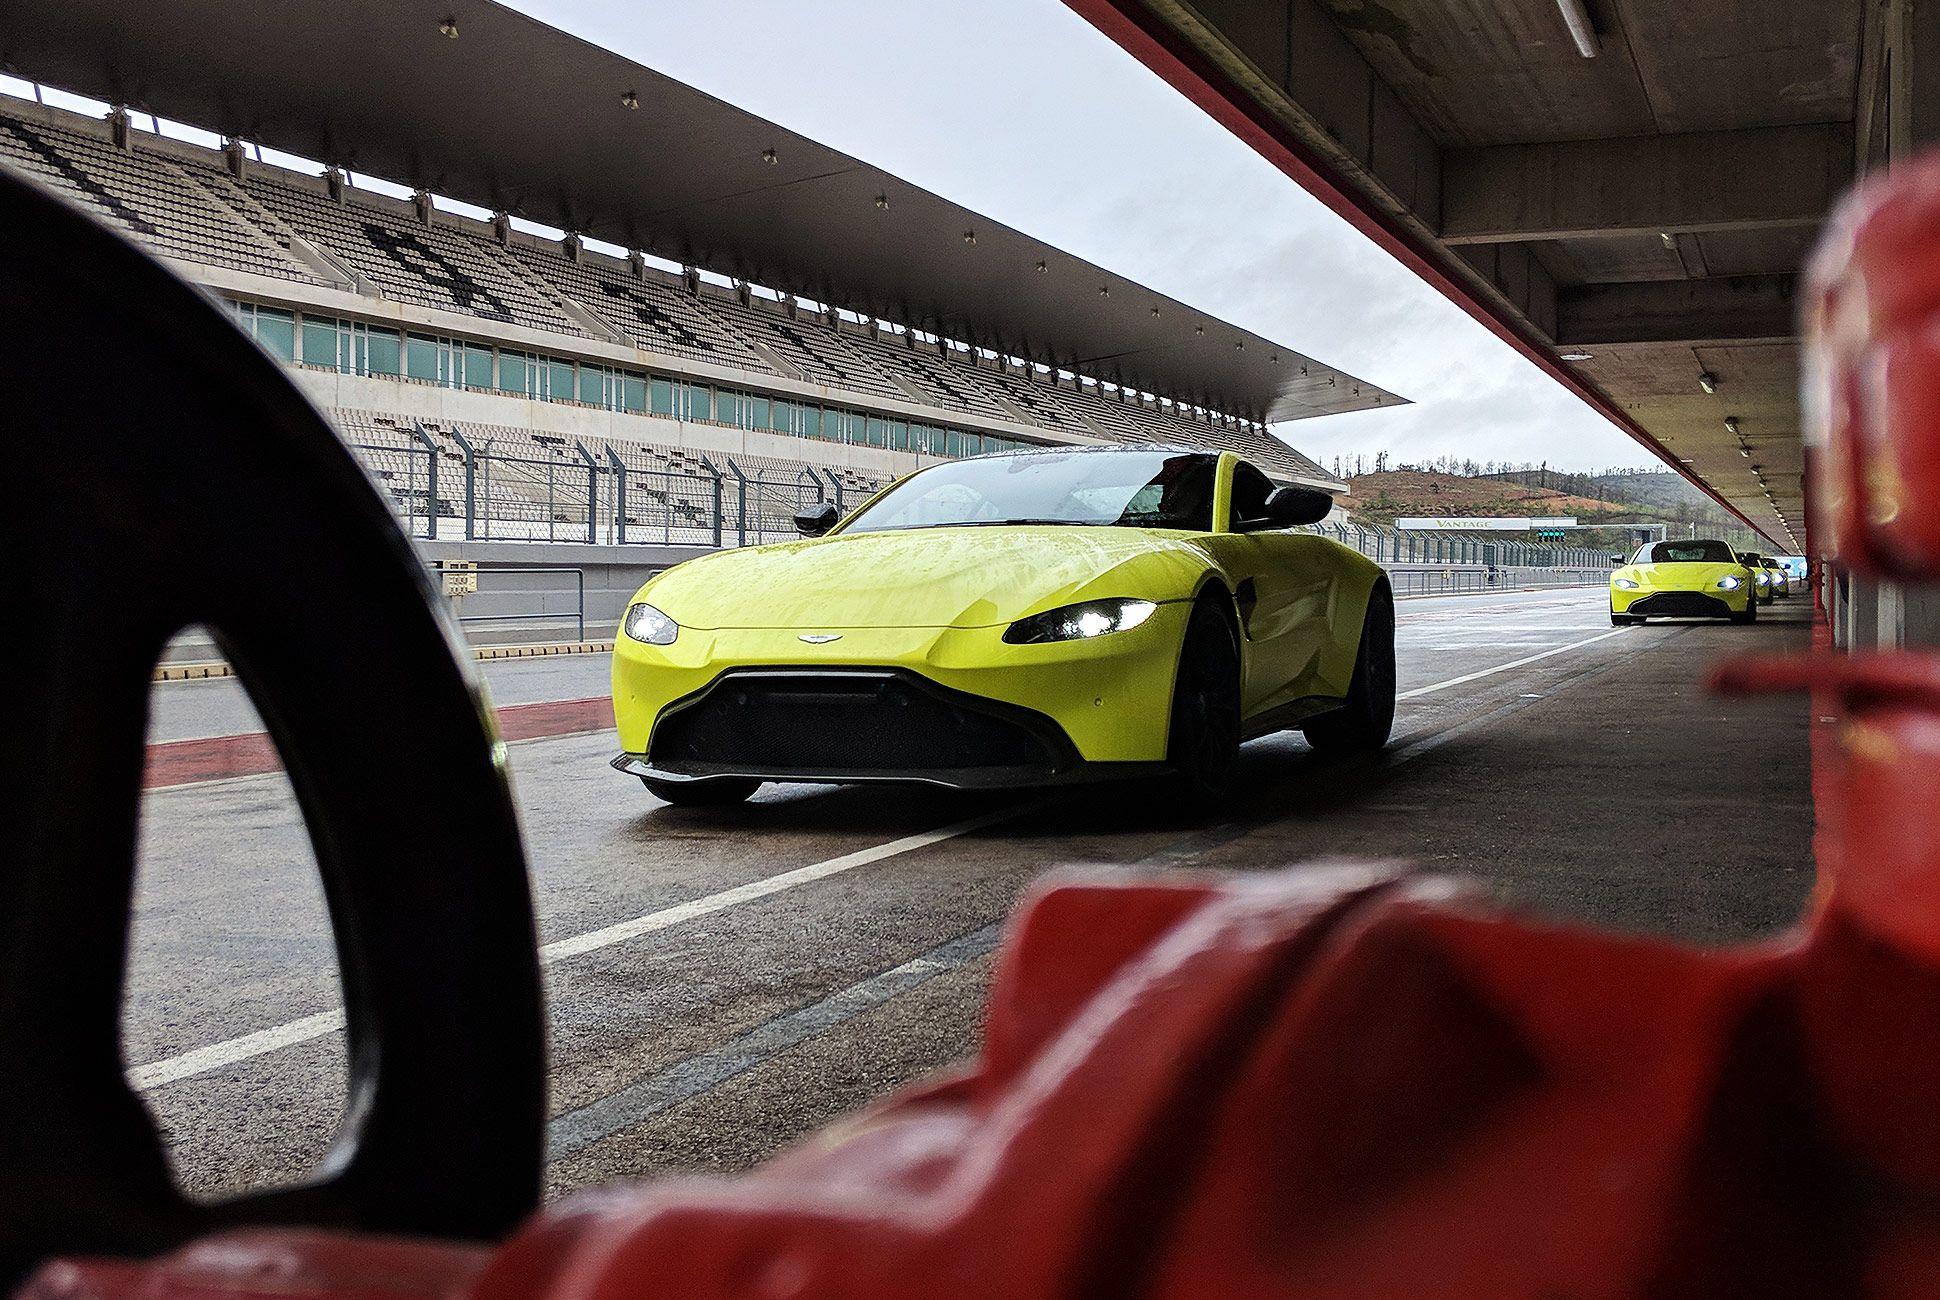 Aston-Vantage-Review-gear-patrol-slide-1